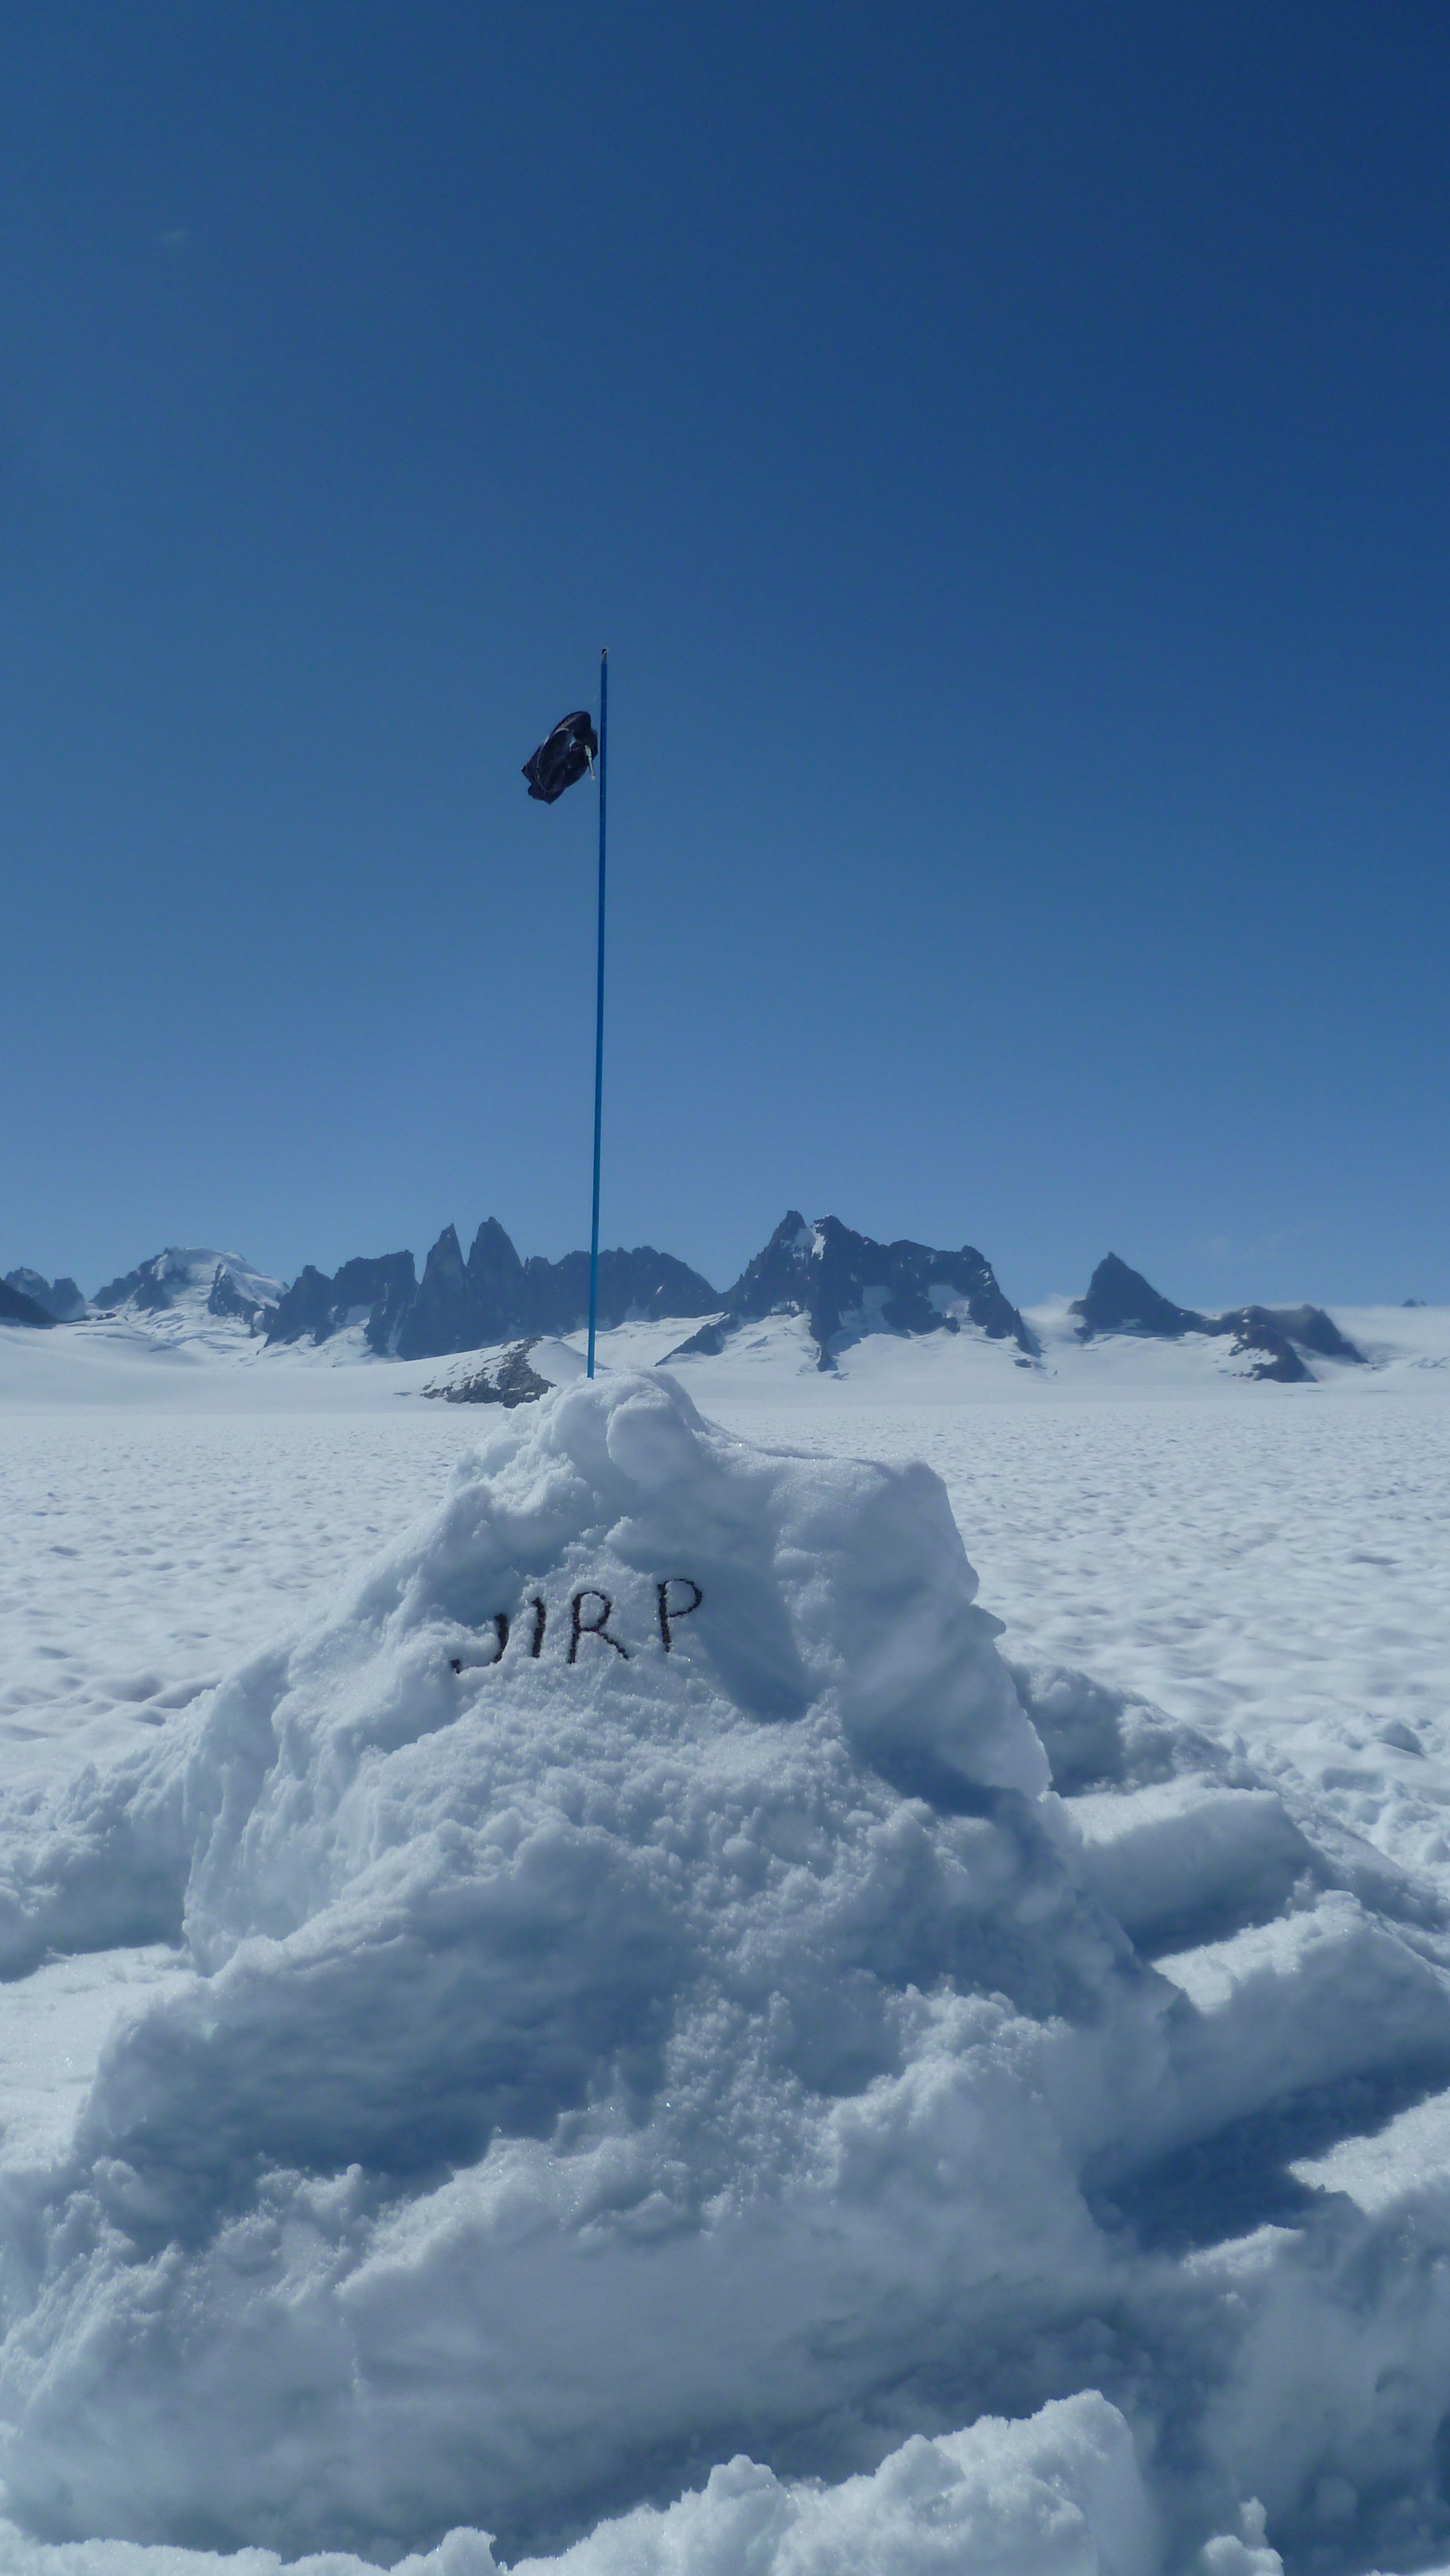 The JIRP mass balance snow throne. photo by Danielle B.